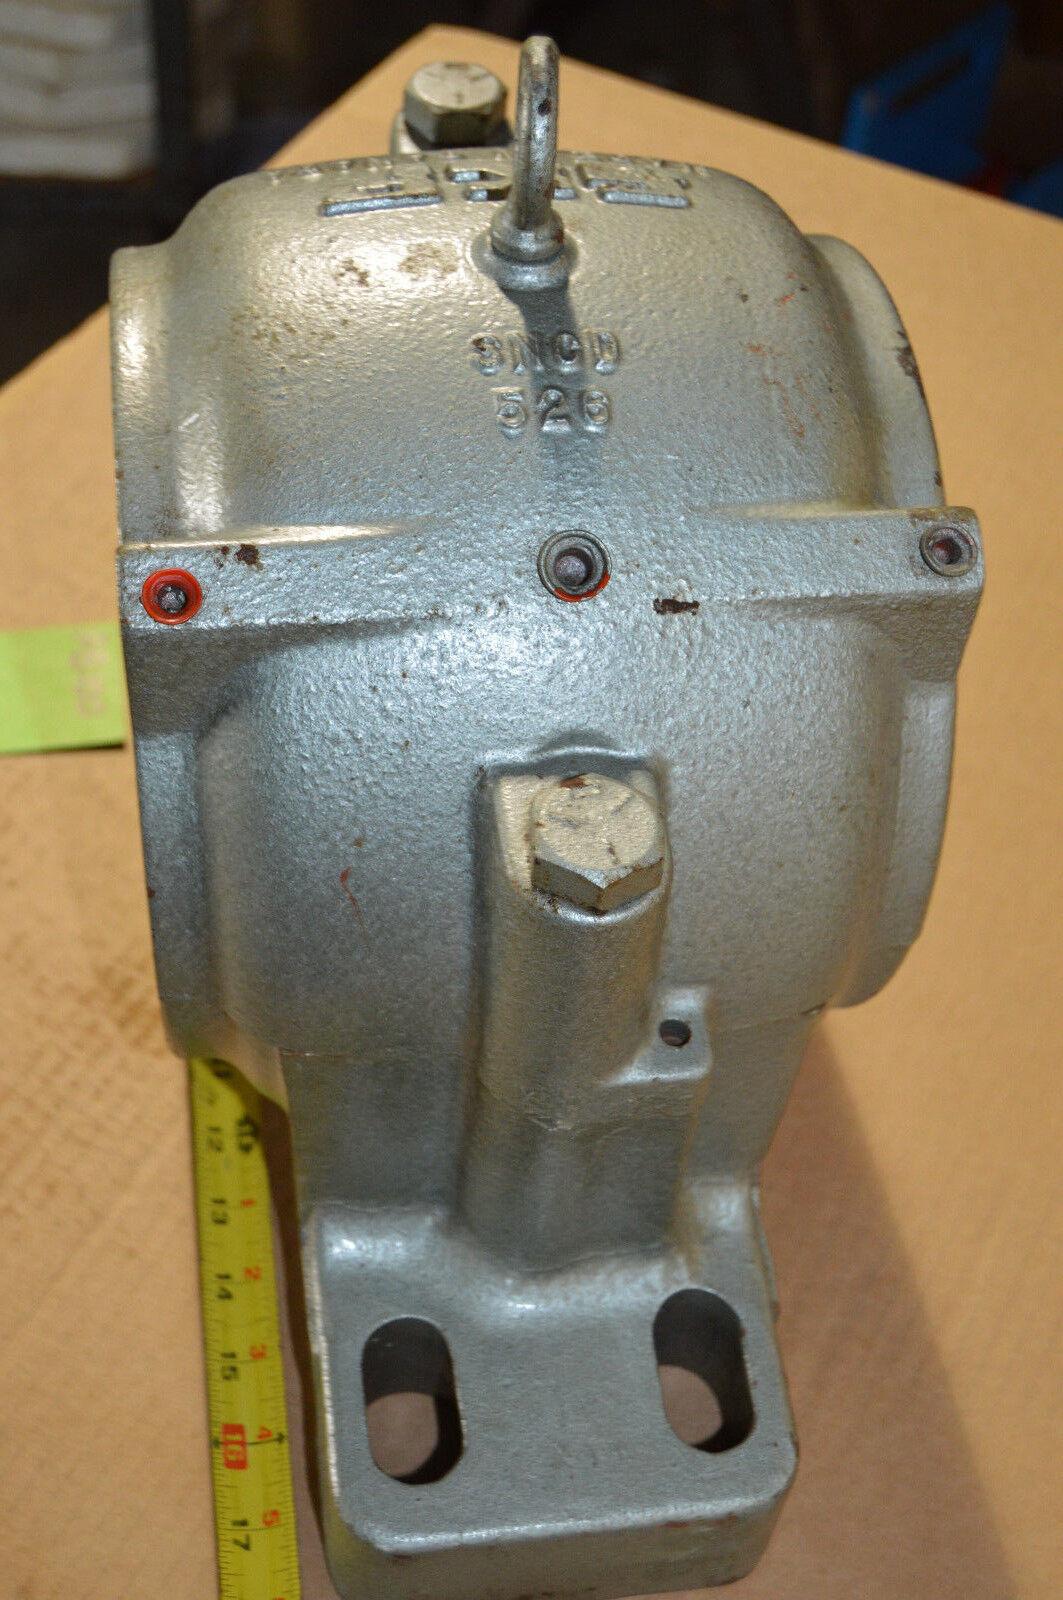 P3786 0003786 JBC Tools Shield 0.204 inch X 0.204 Inch